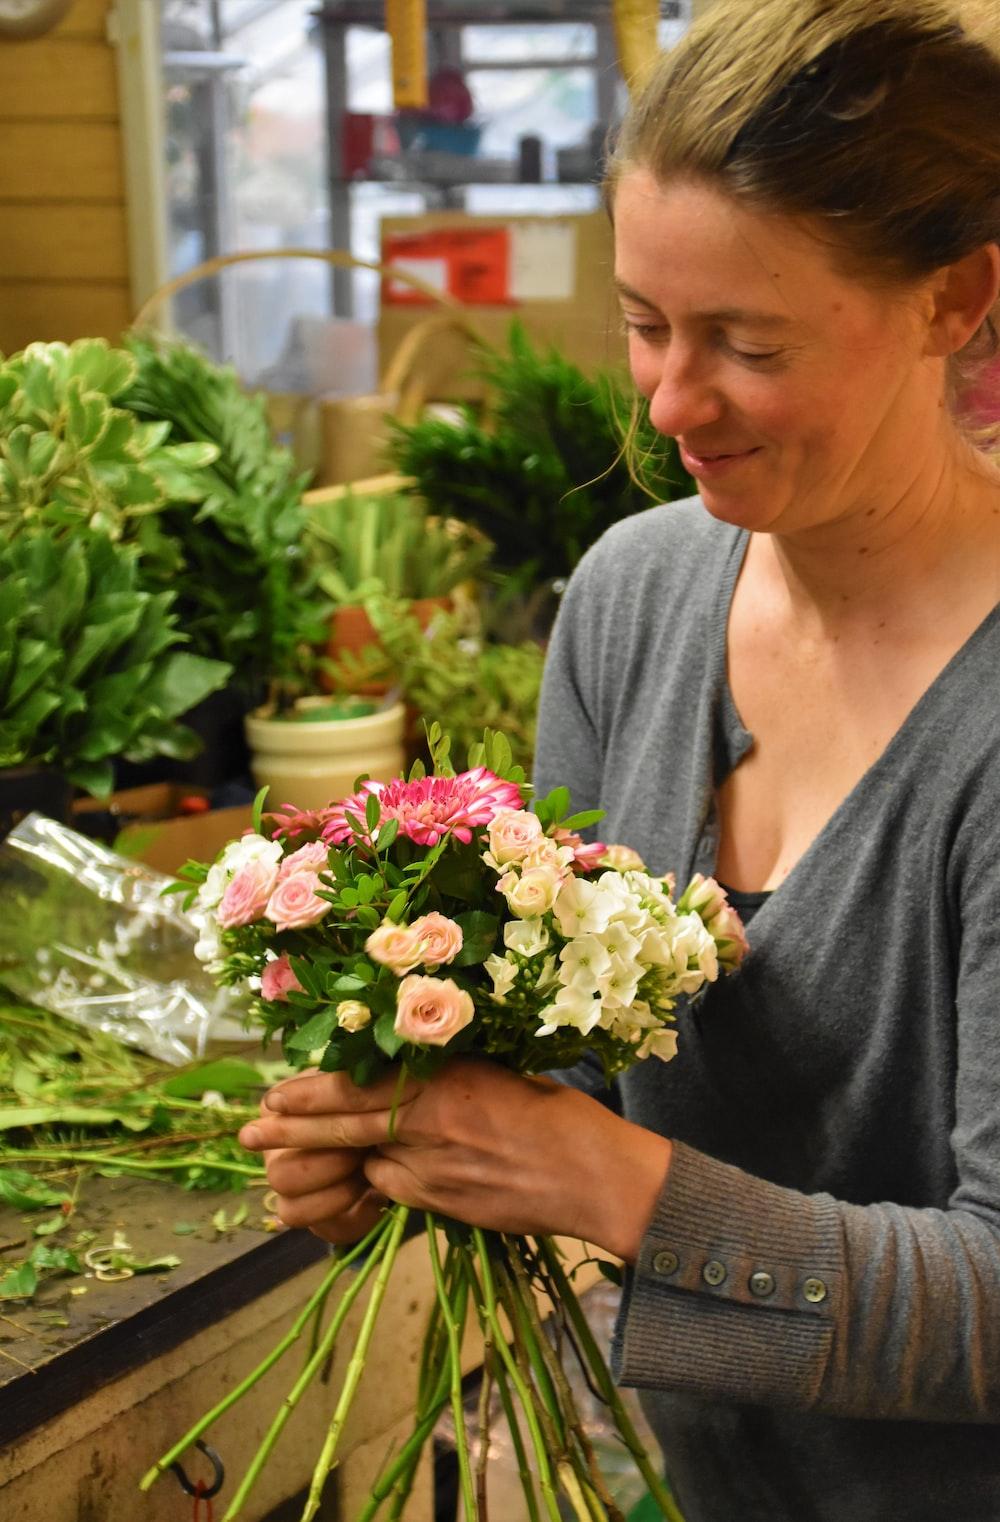 woman wearing gray cardigan holding flower bouquet